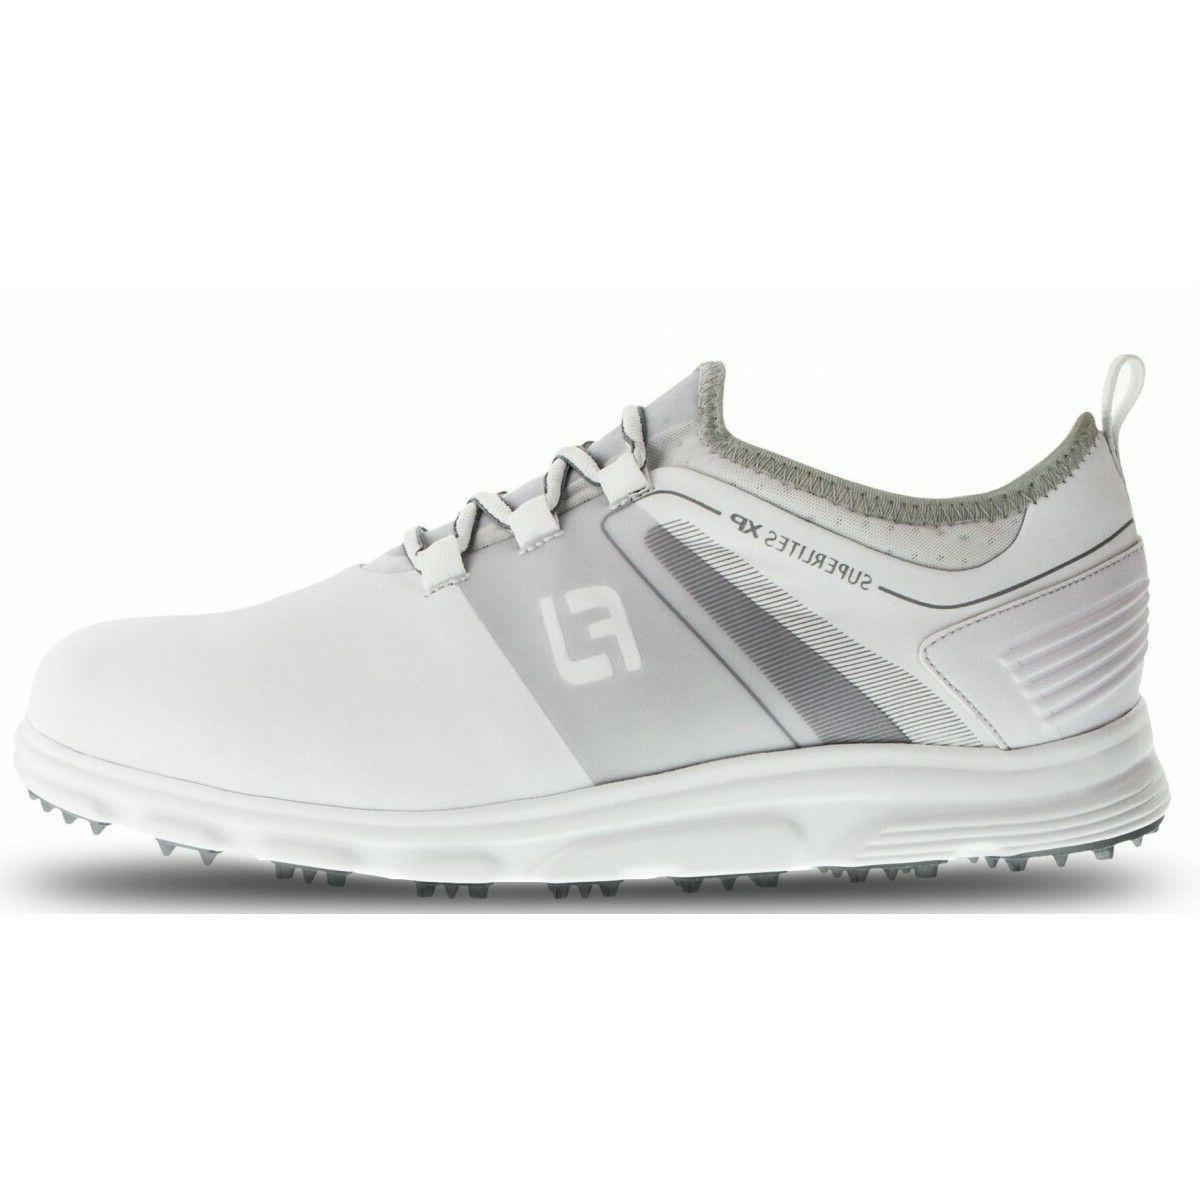 new superlites xp golf shoes choose size